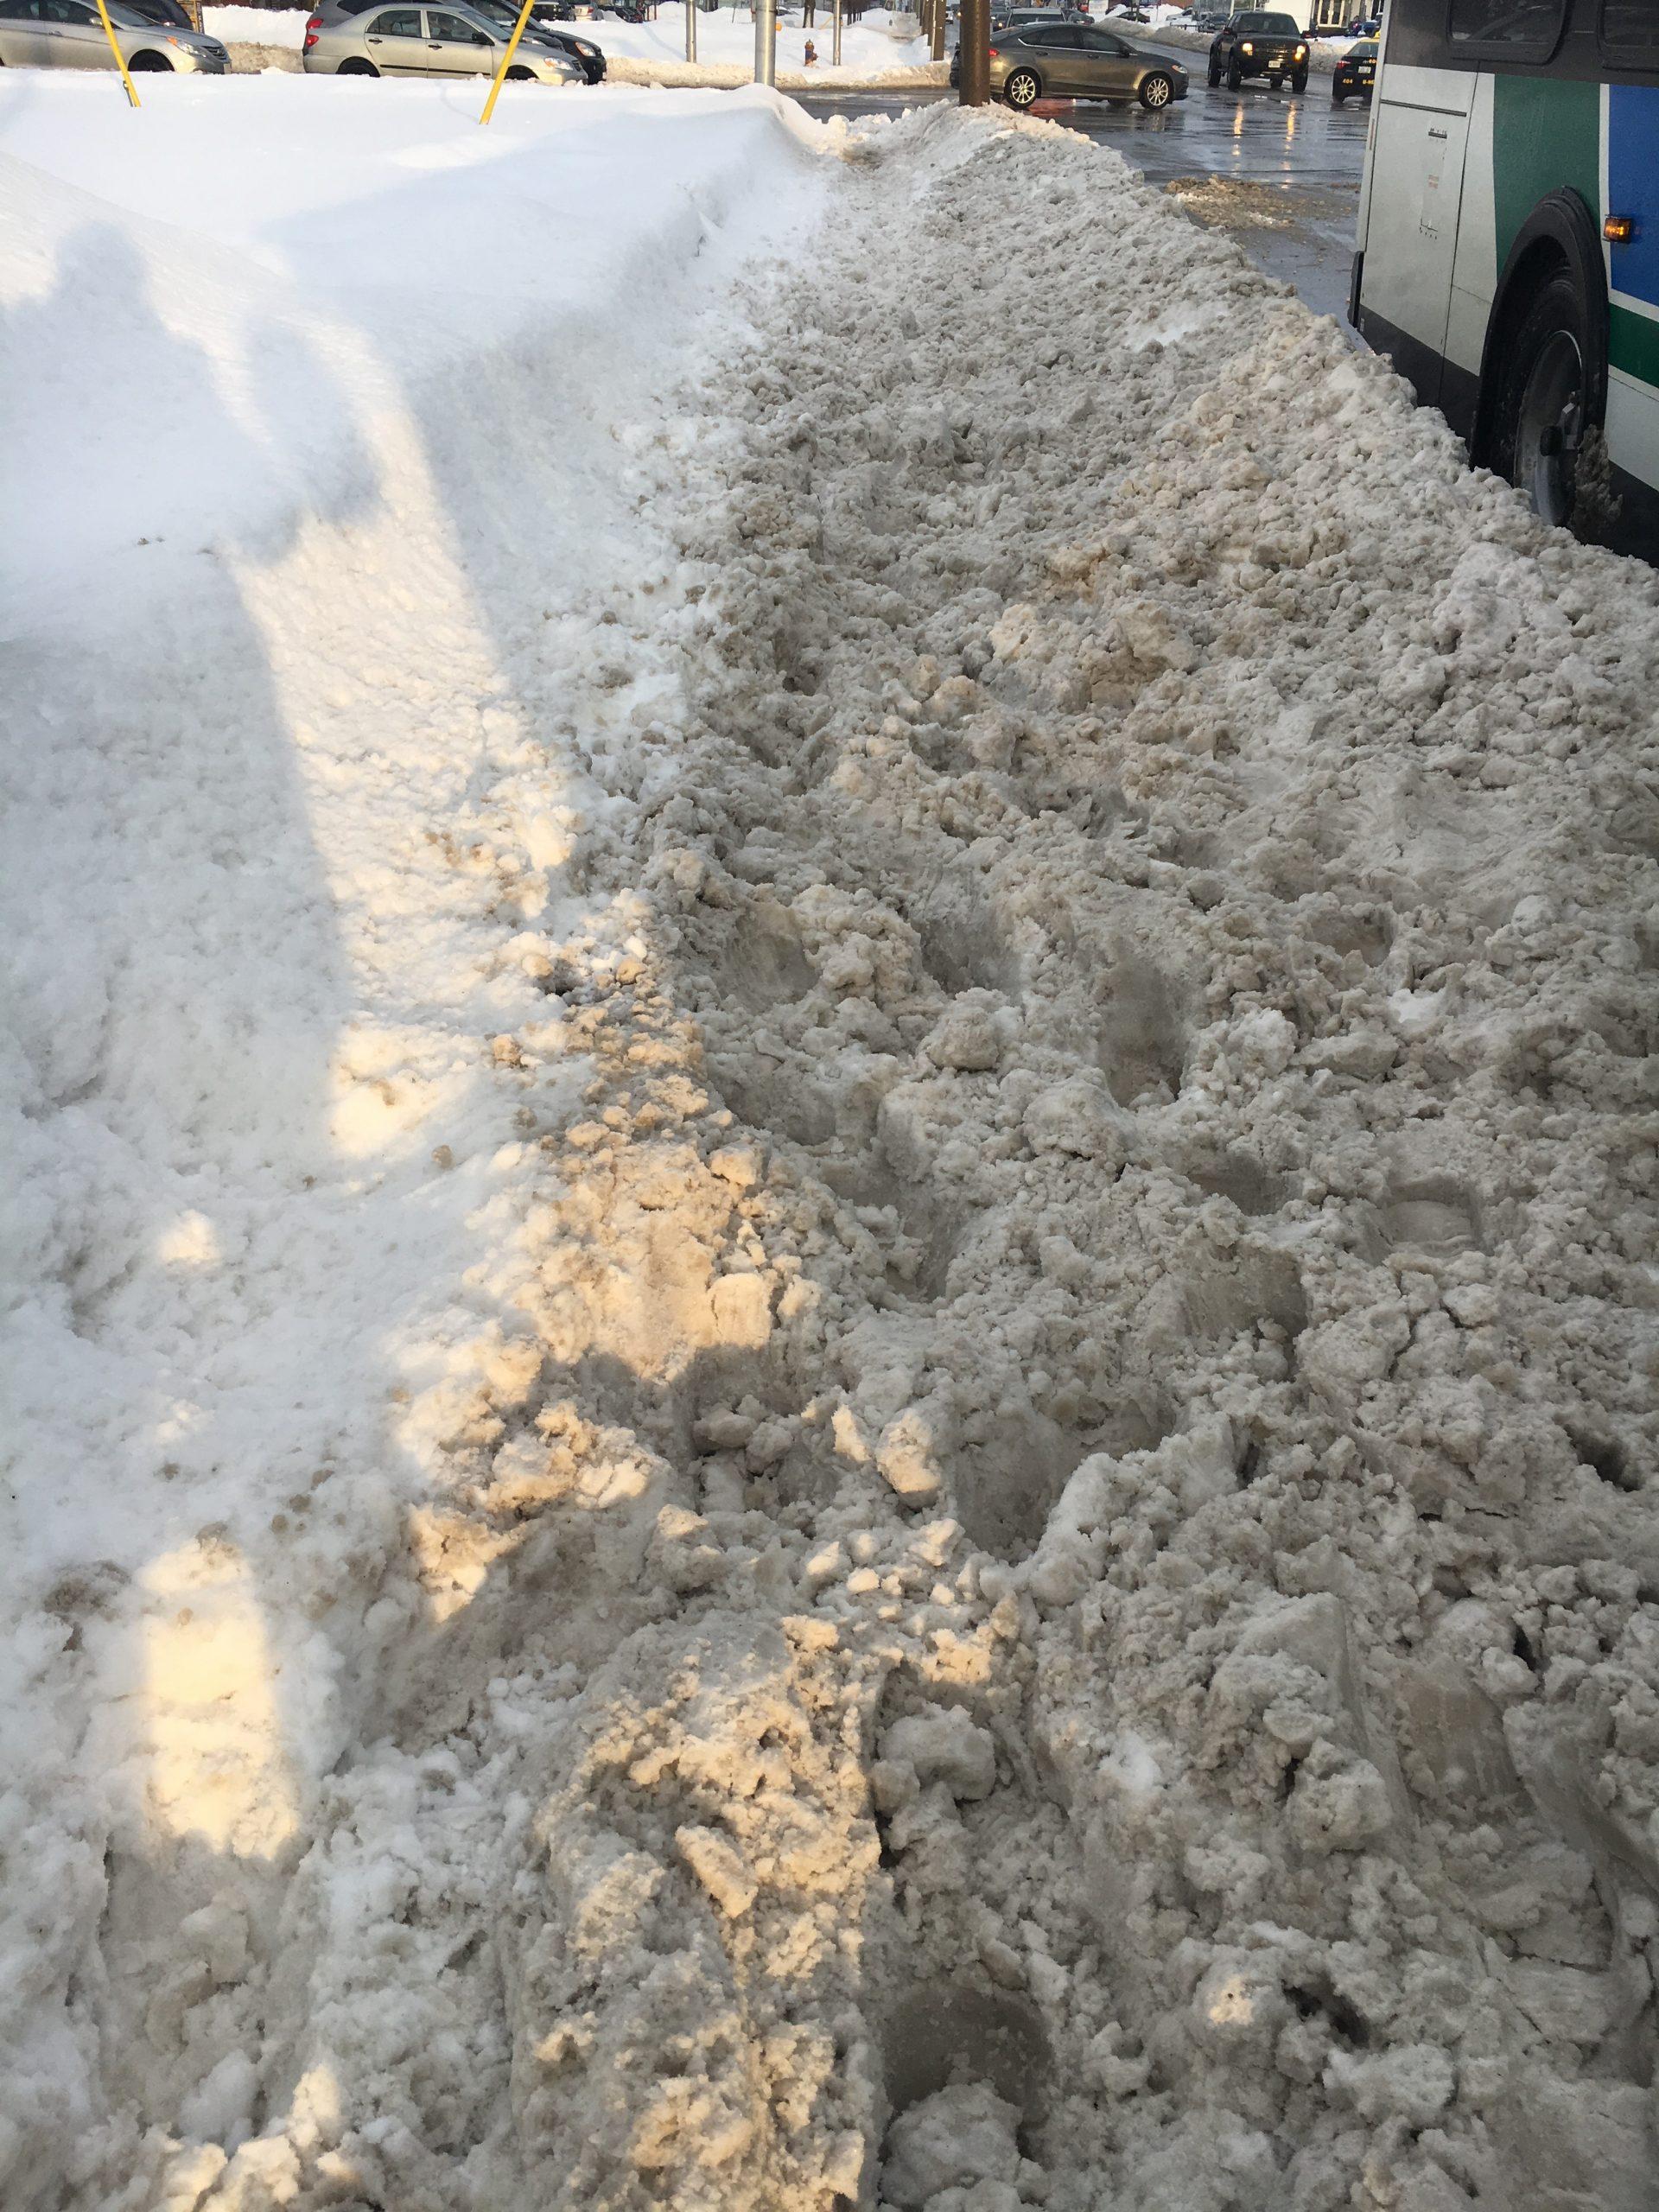 Pedestrians struggle with snow-filled sidewalks